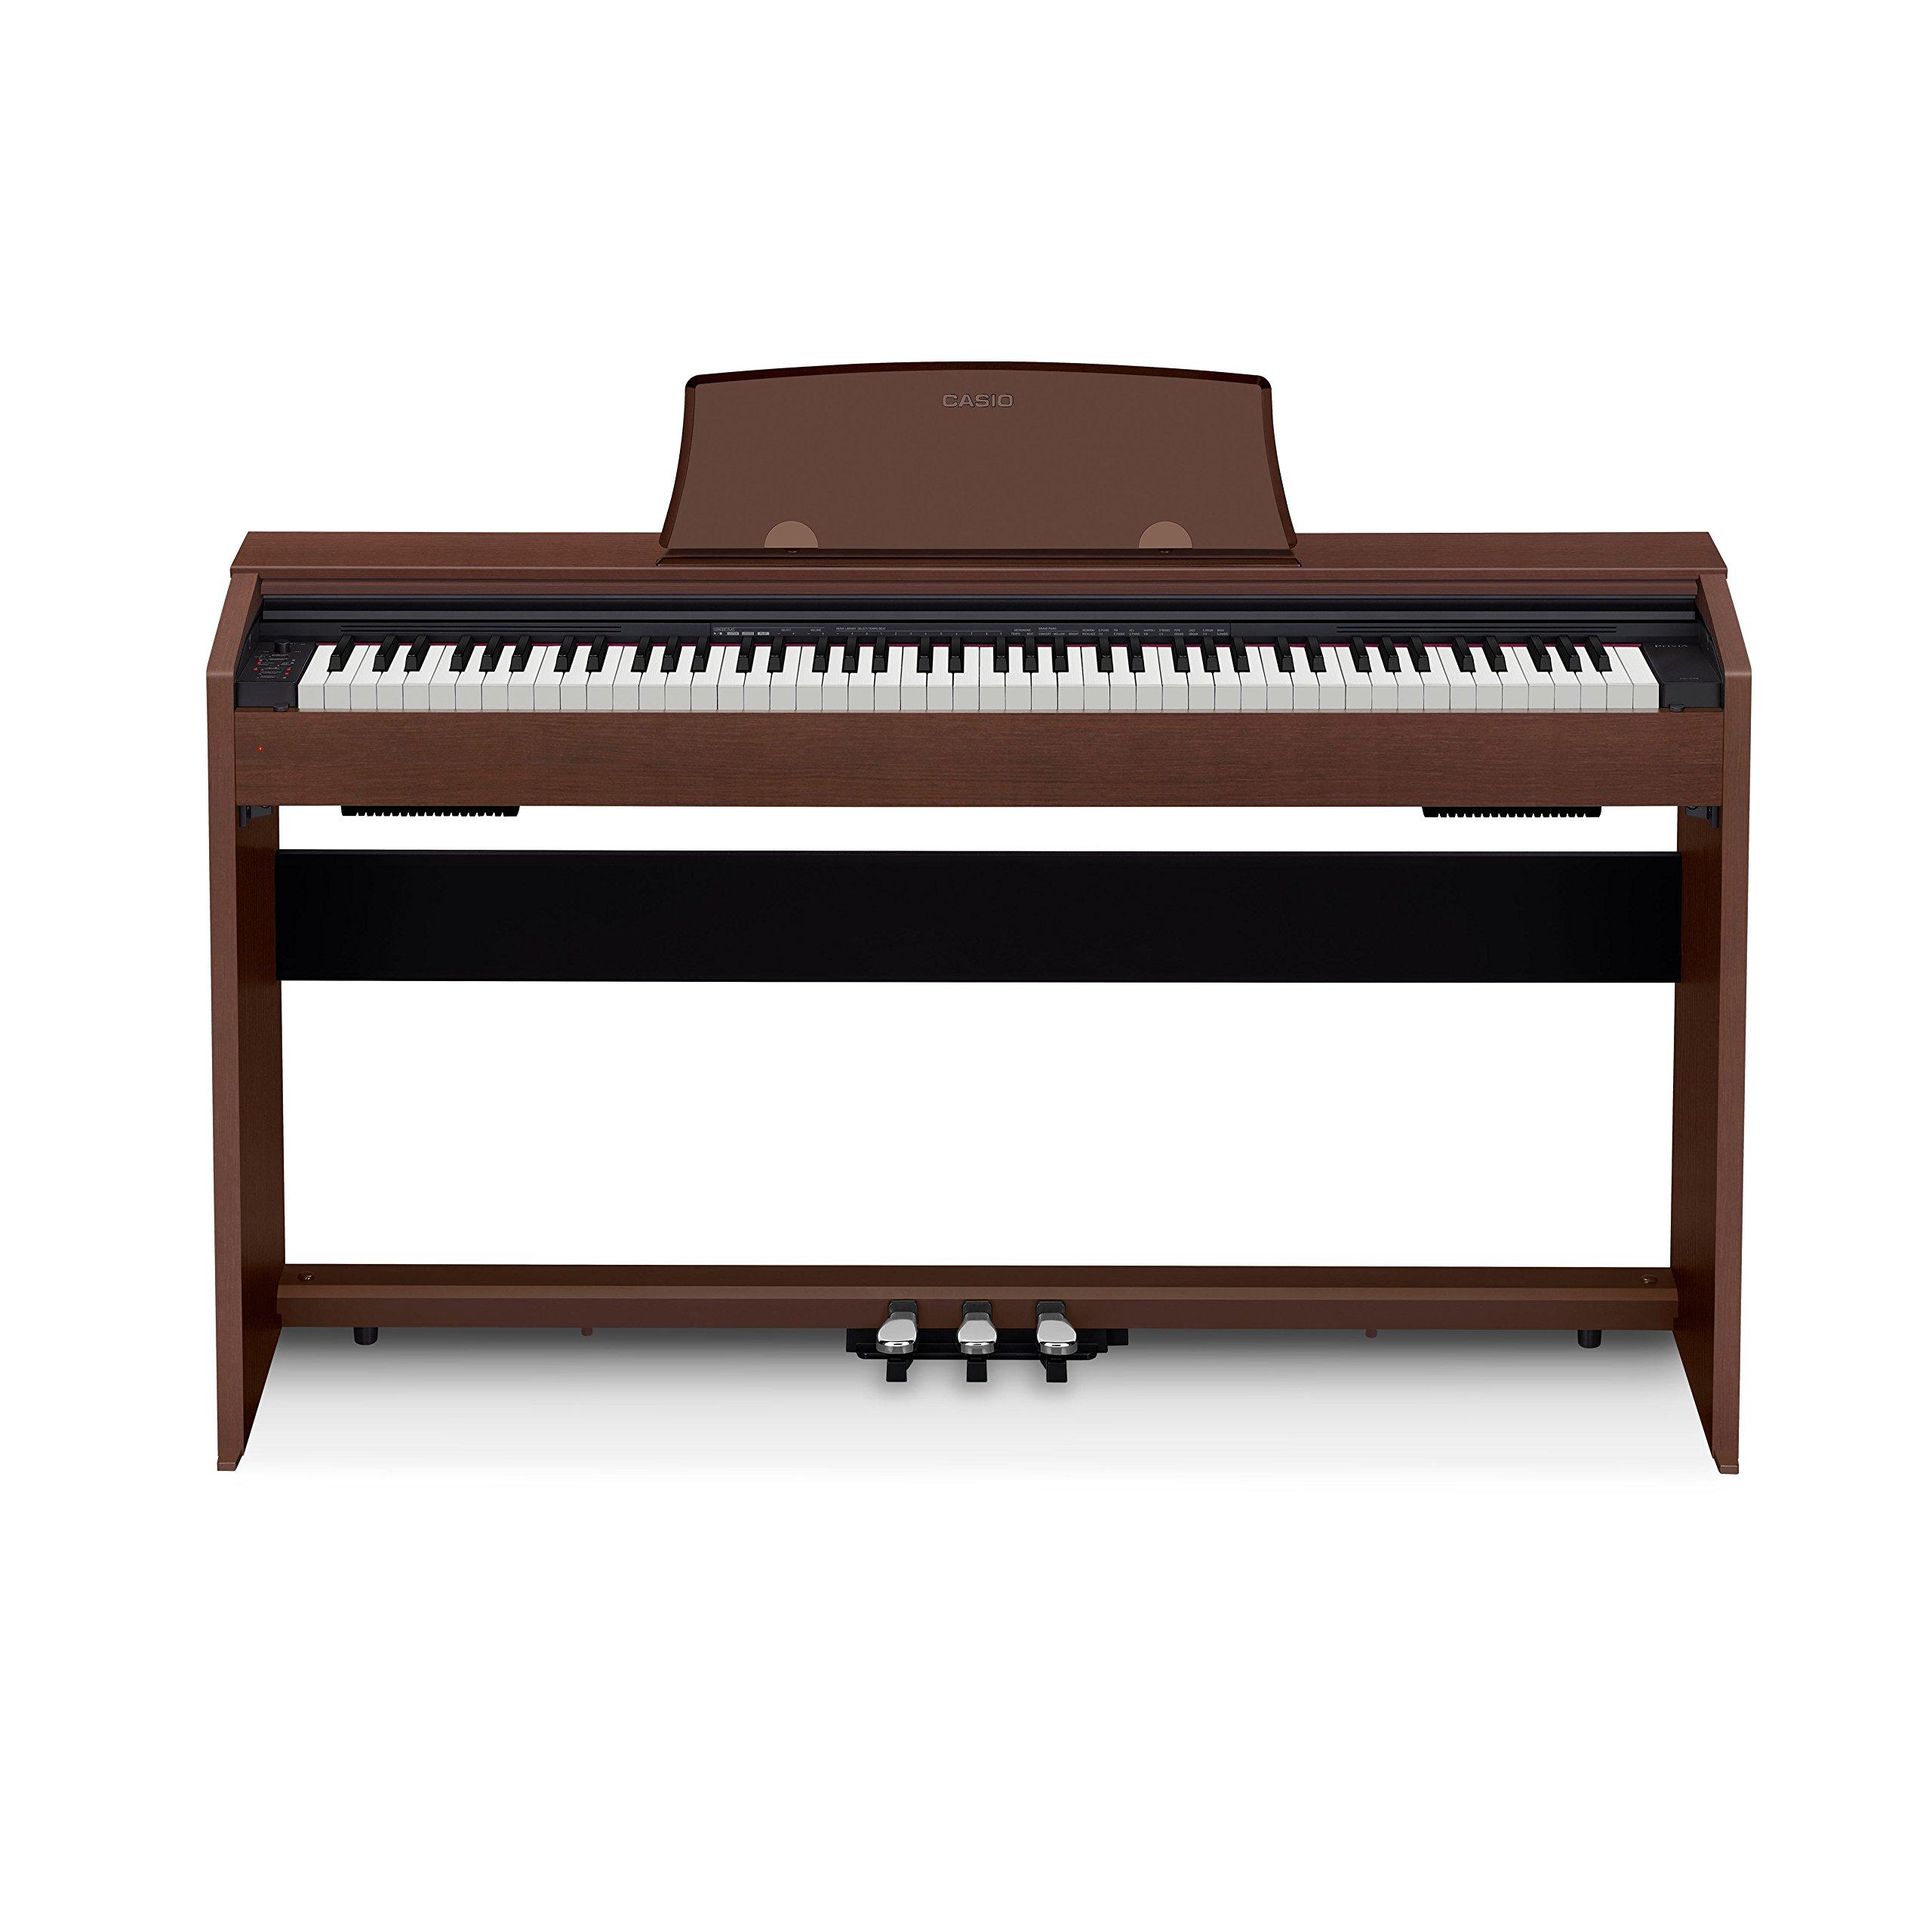 Casio PX-770 BN Privia Digital Home Piano, Brown by Casio